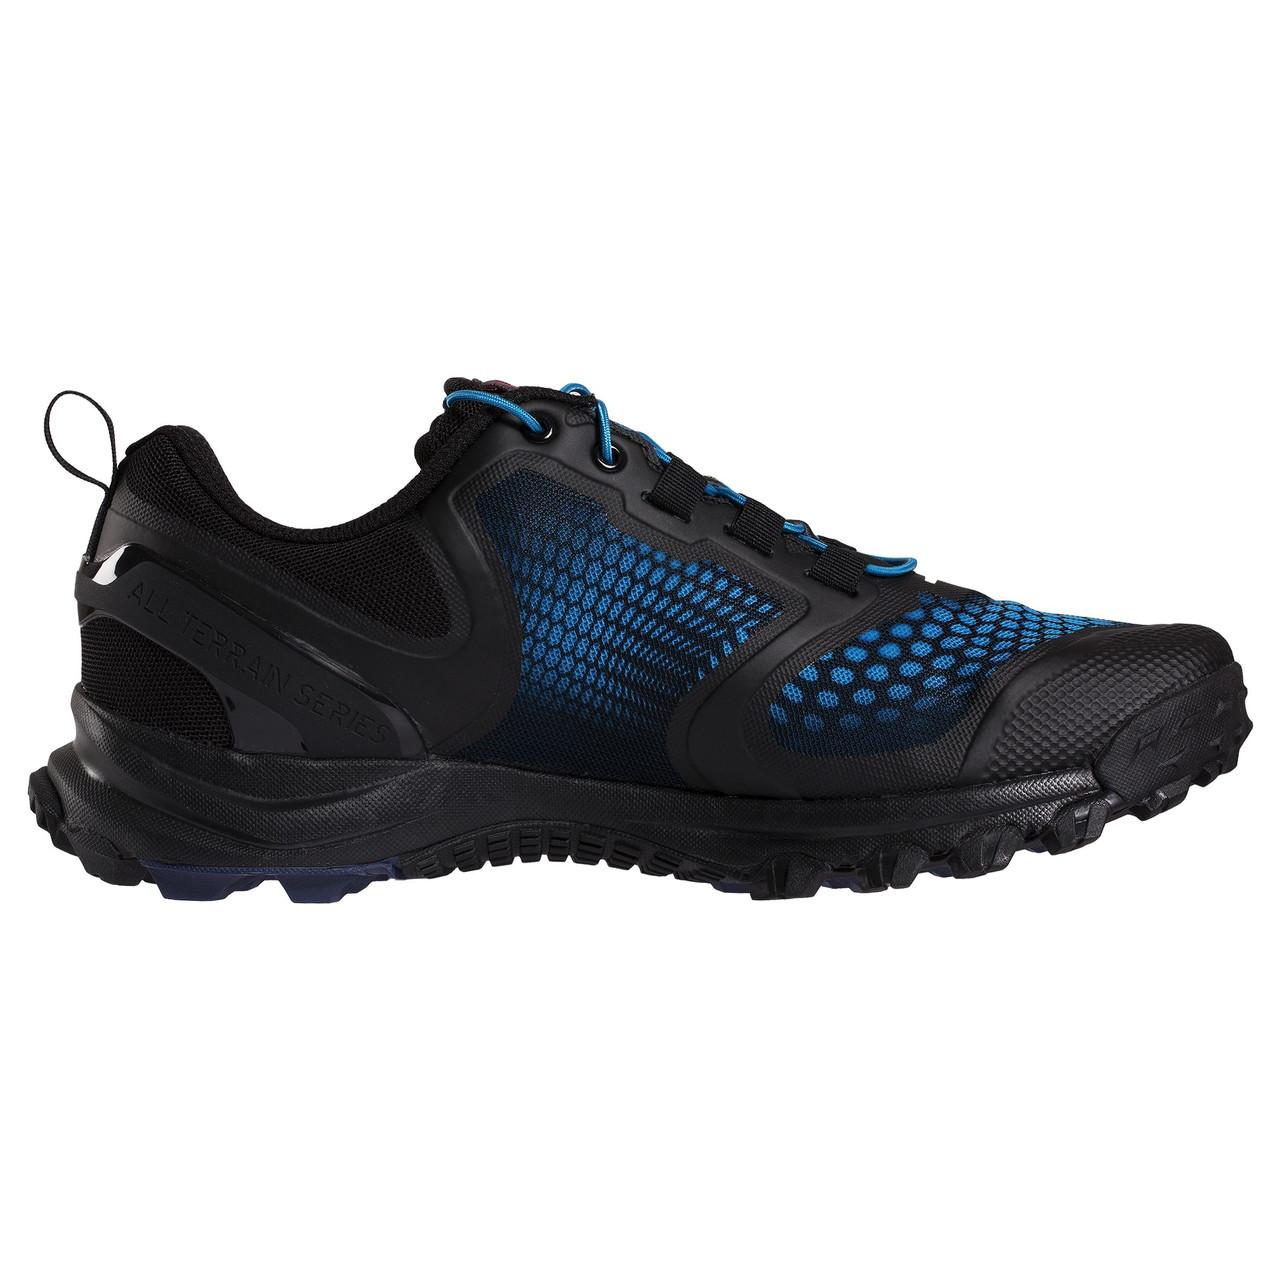 2321f655e3bf Мужские кроссовки Reebok All Terrain Extreme Gore-Tex BD4150 -  Интернет-магазин спортивной одежды